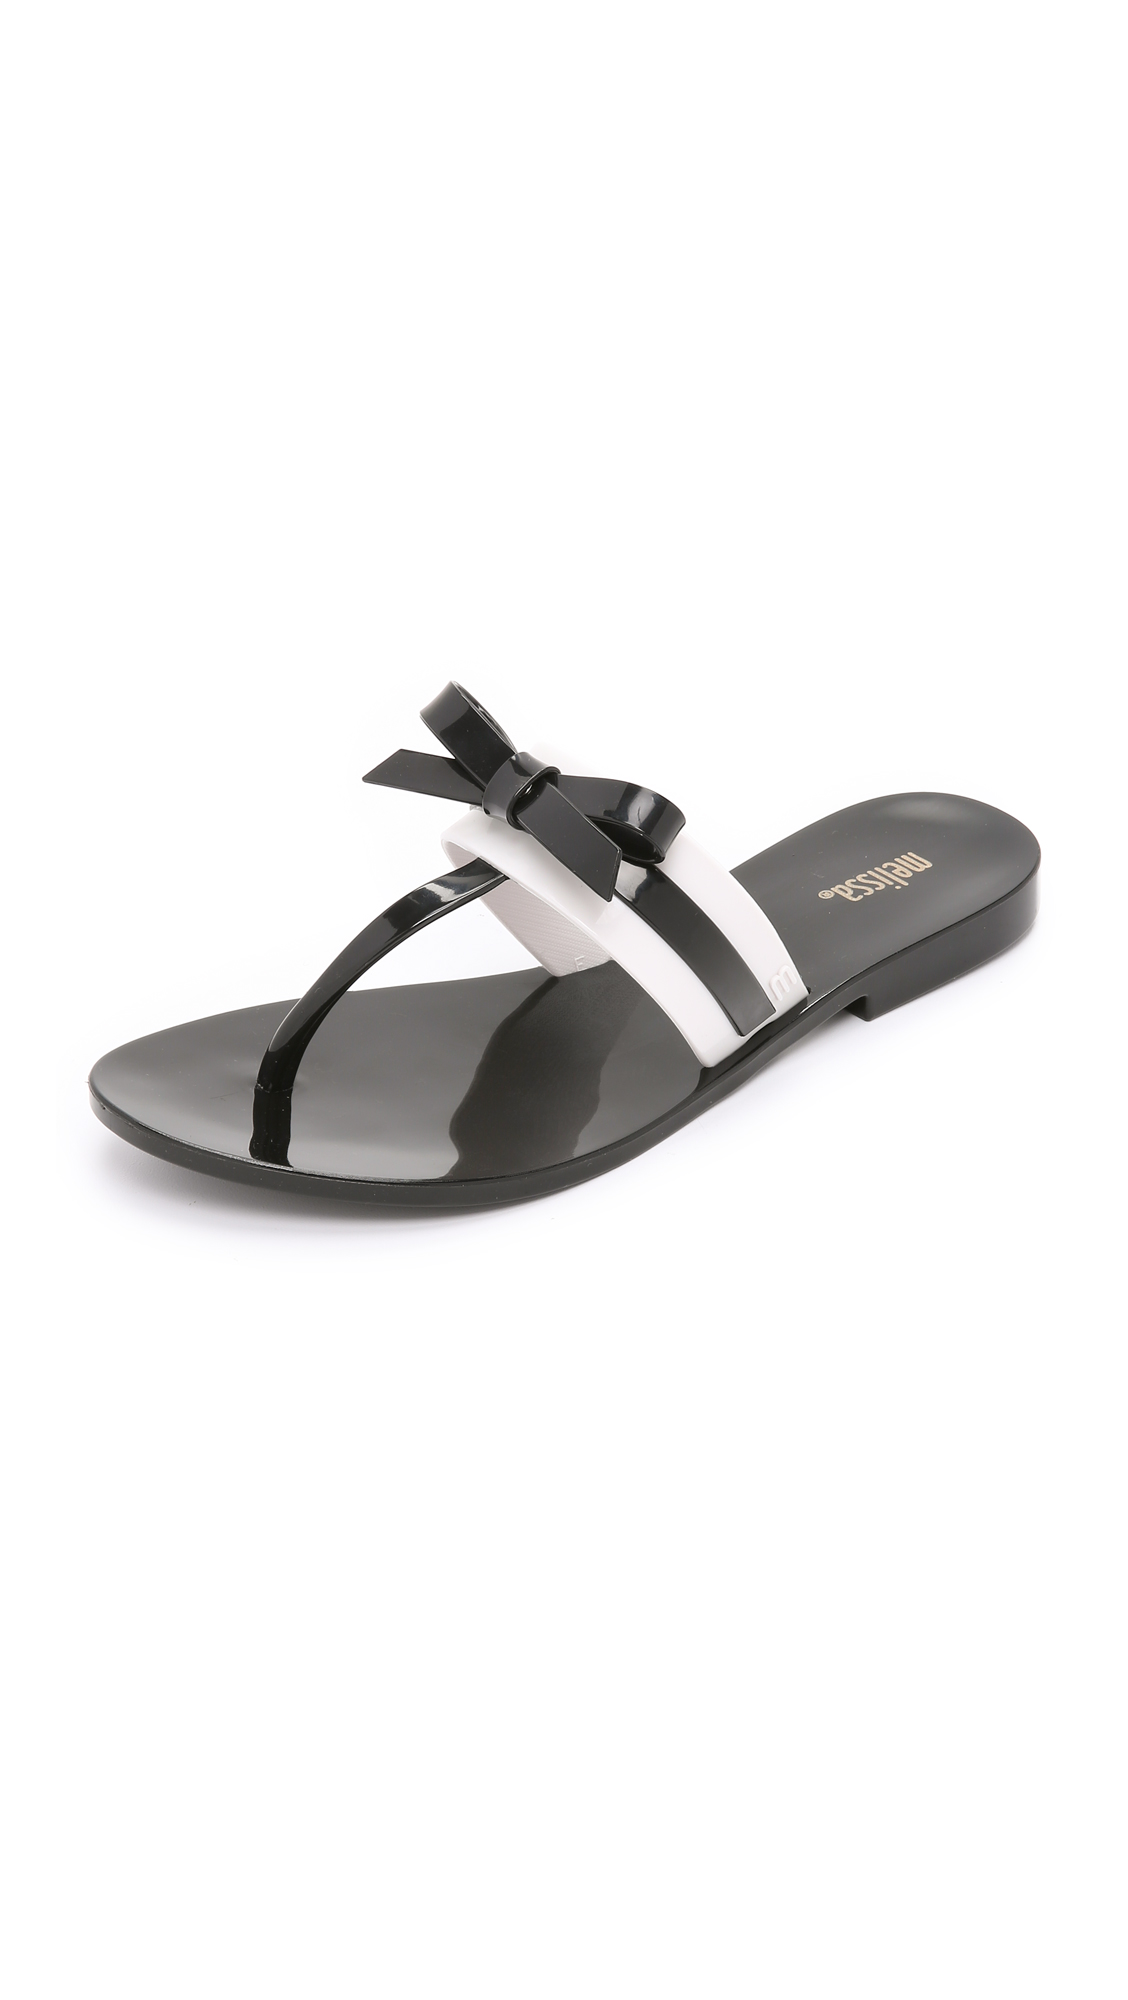 5de20d328593f2 Melissa Garota Bow Flip Flops